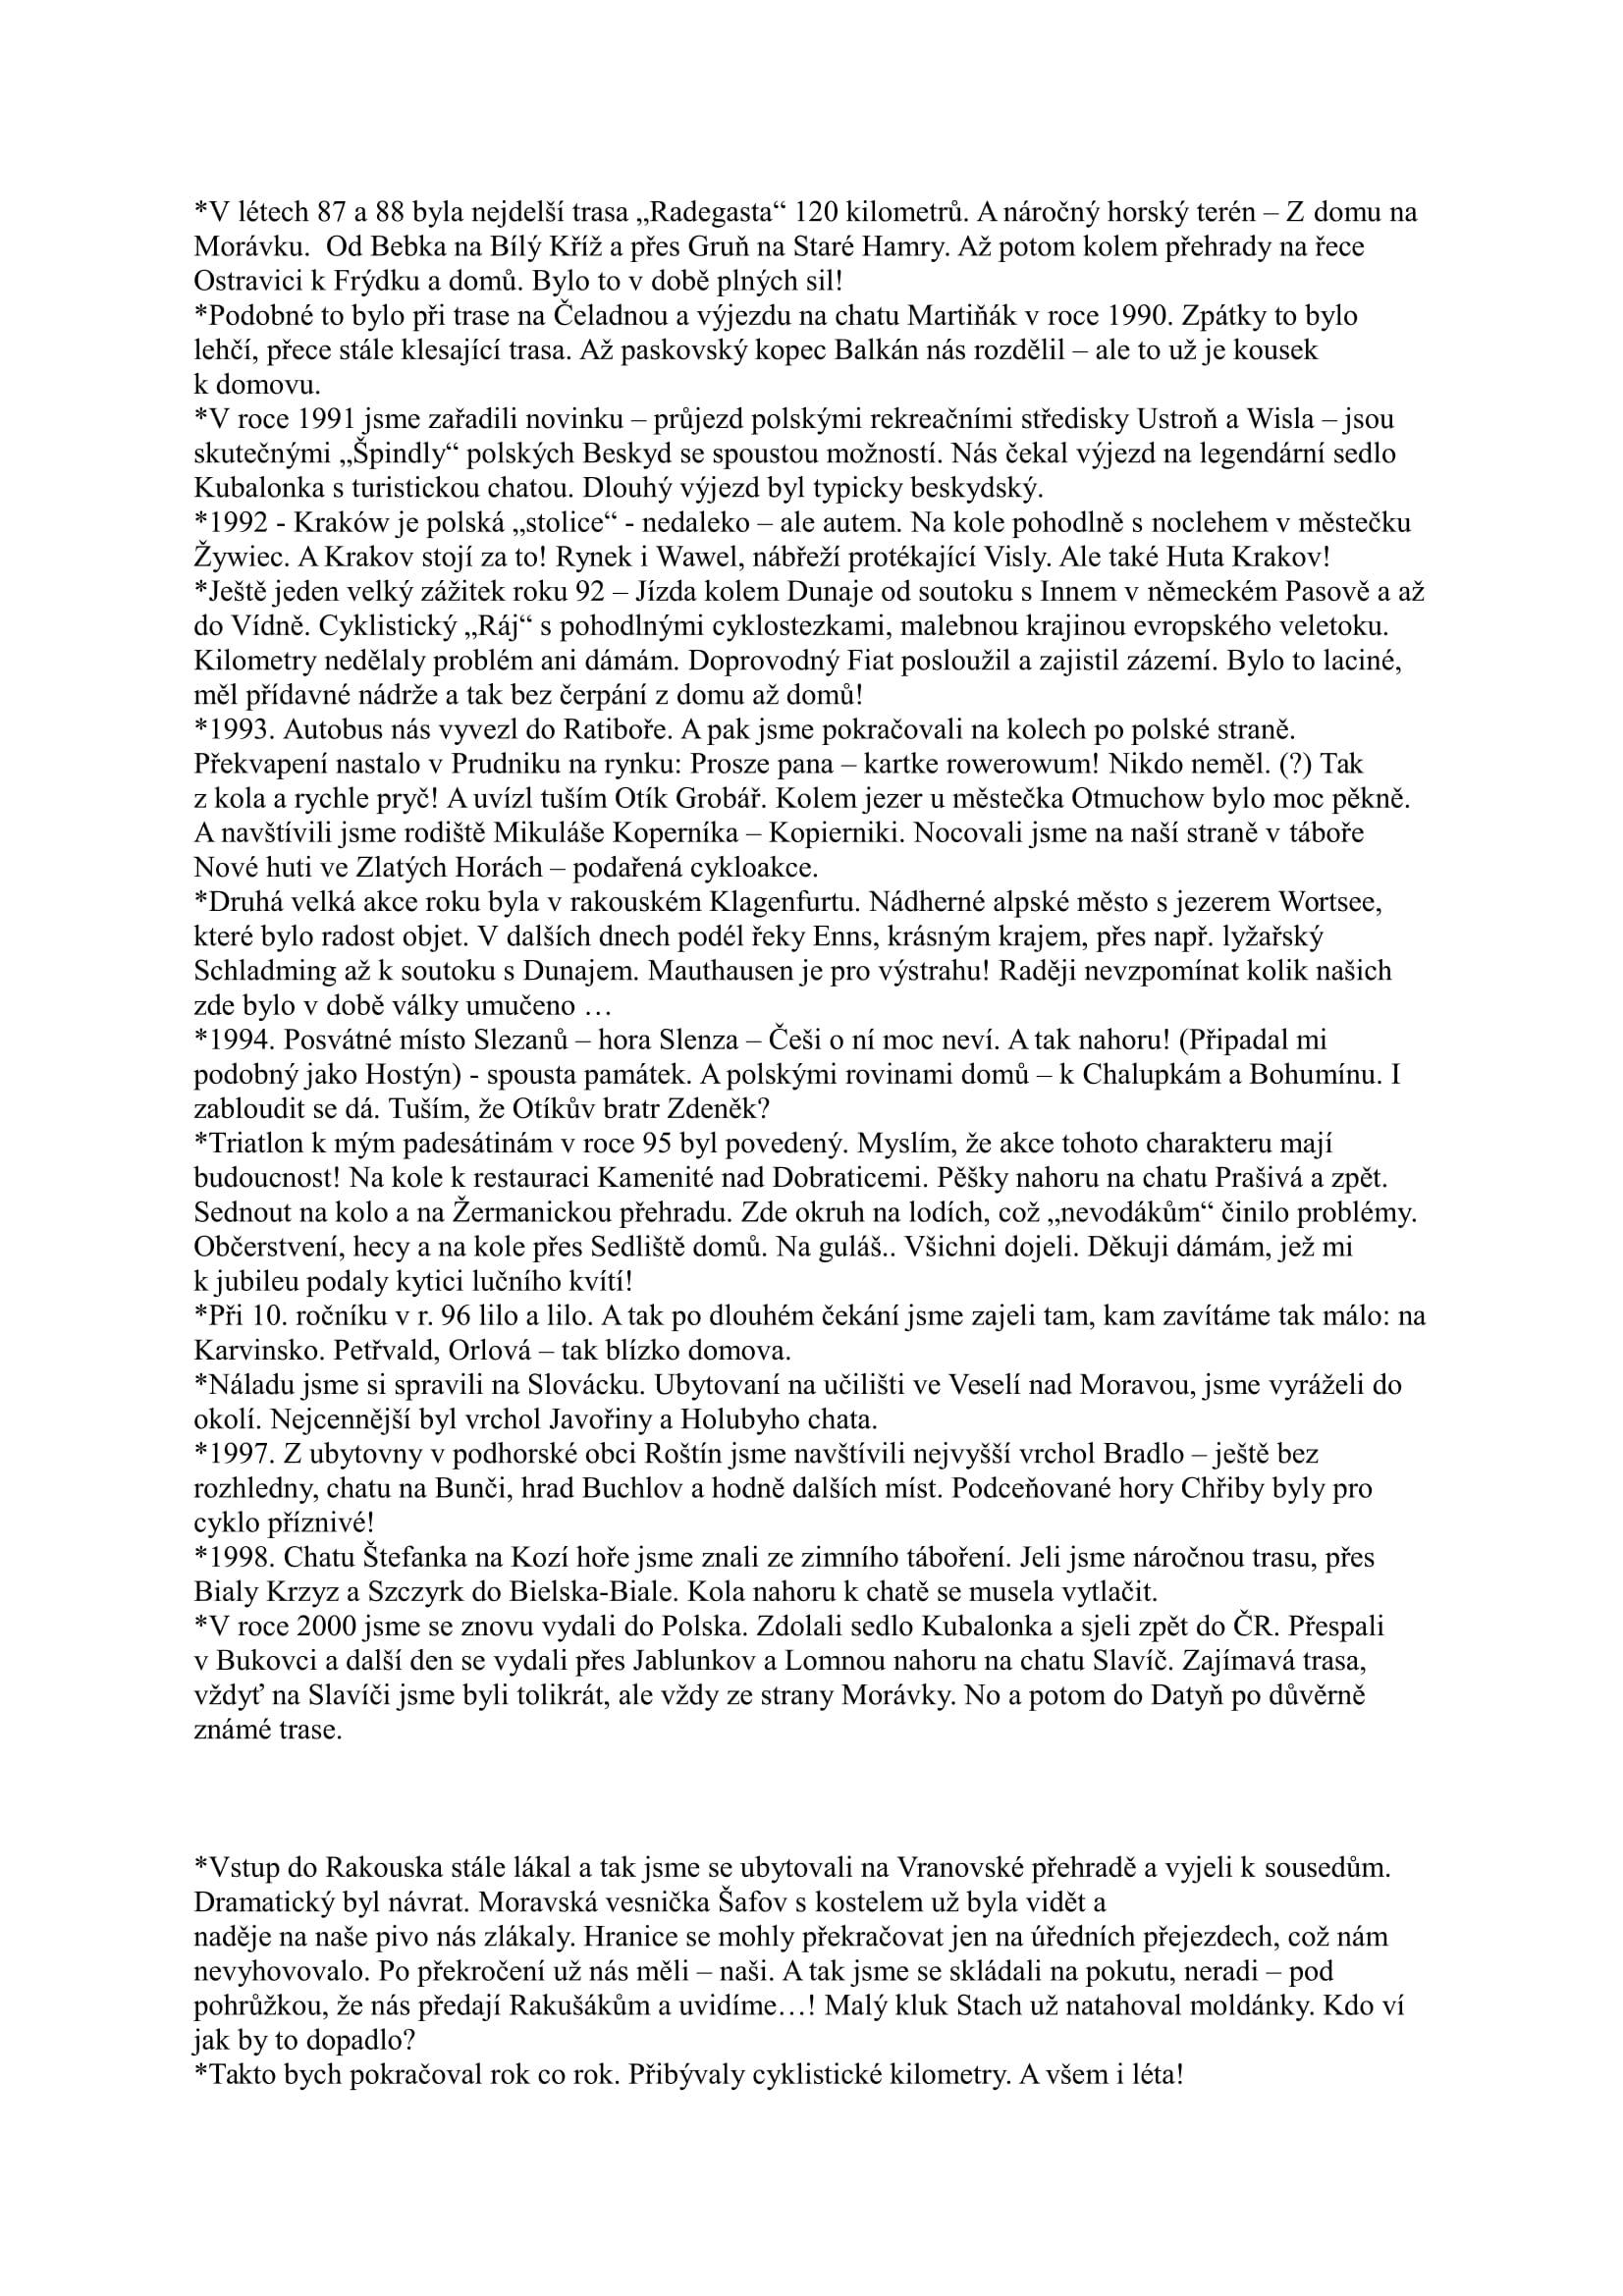 Sborník 50 let chata-14